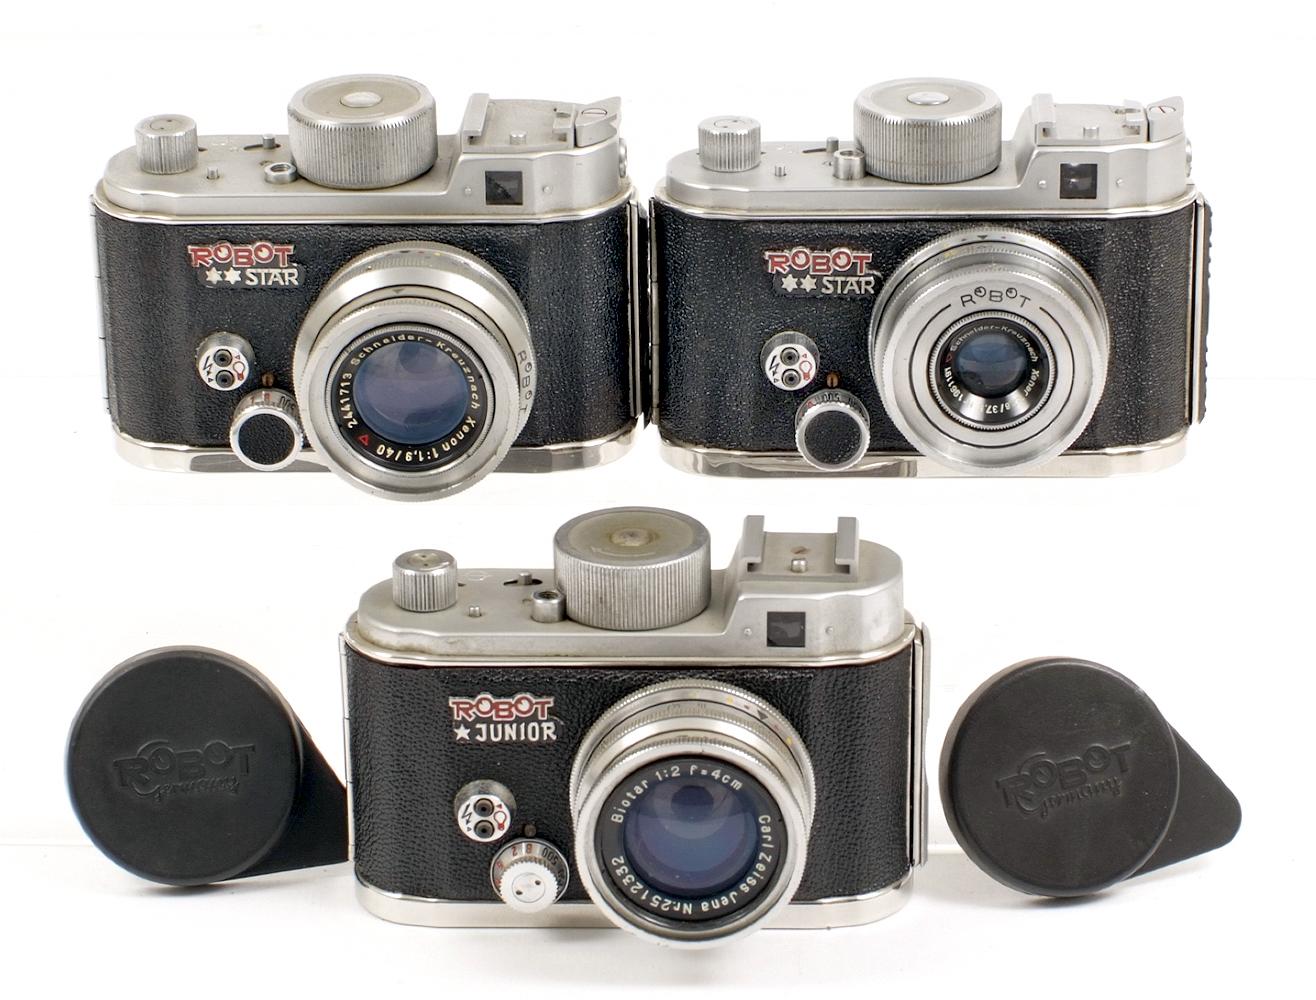 Lot 24 - Two Robot Star & a Robot Junior Clockwork Cameras. #D156283 (working) with Xenar 37.5mm f2.